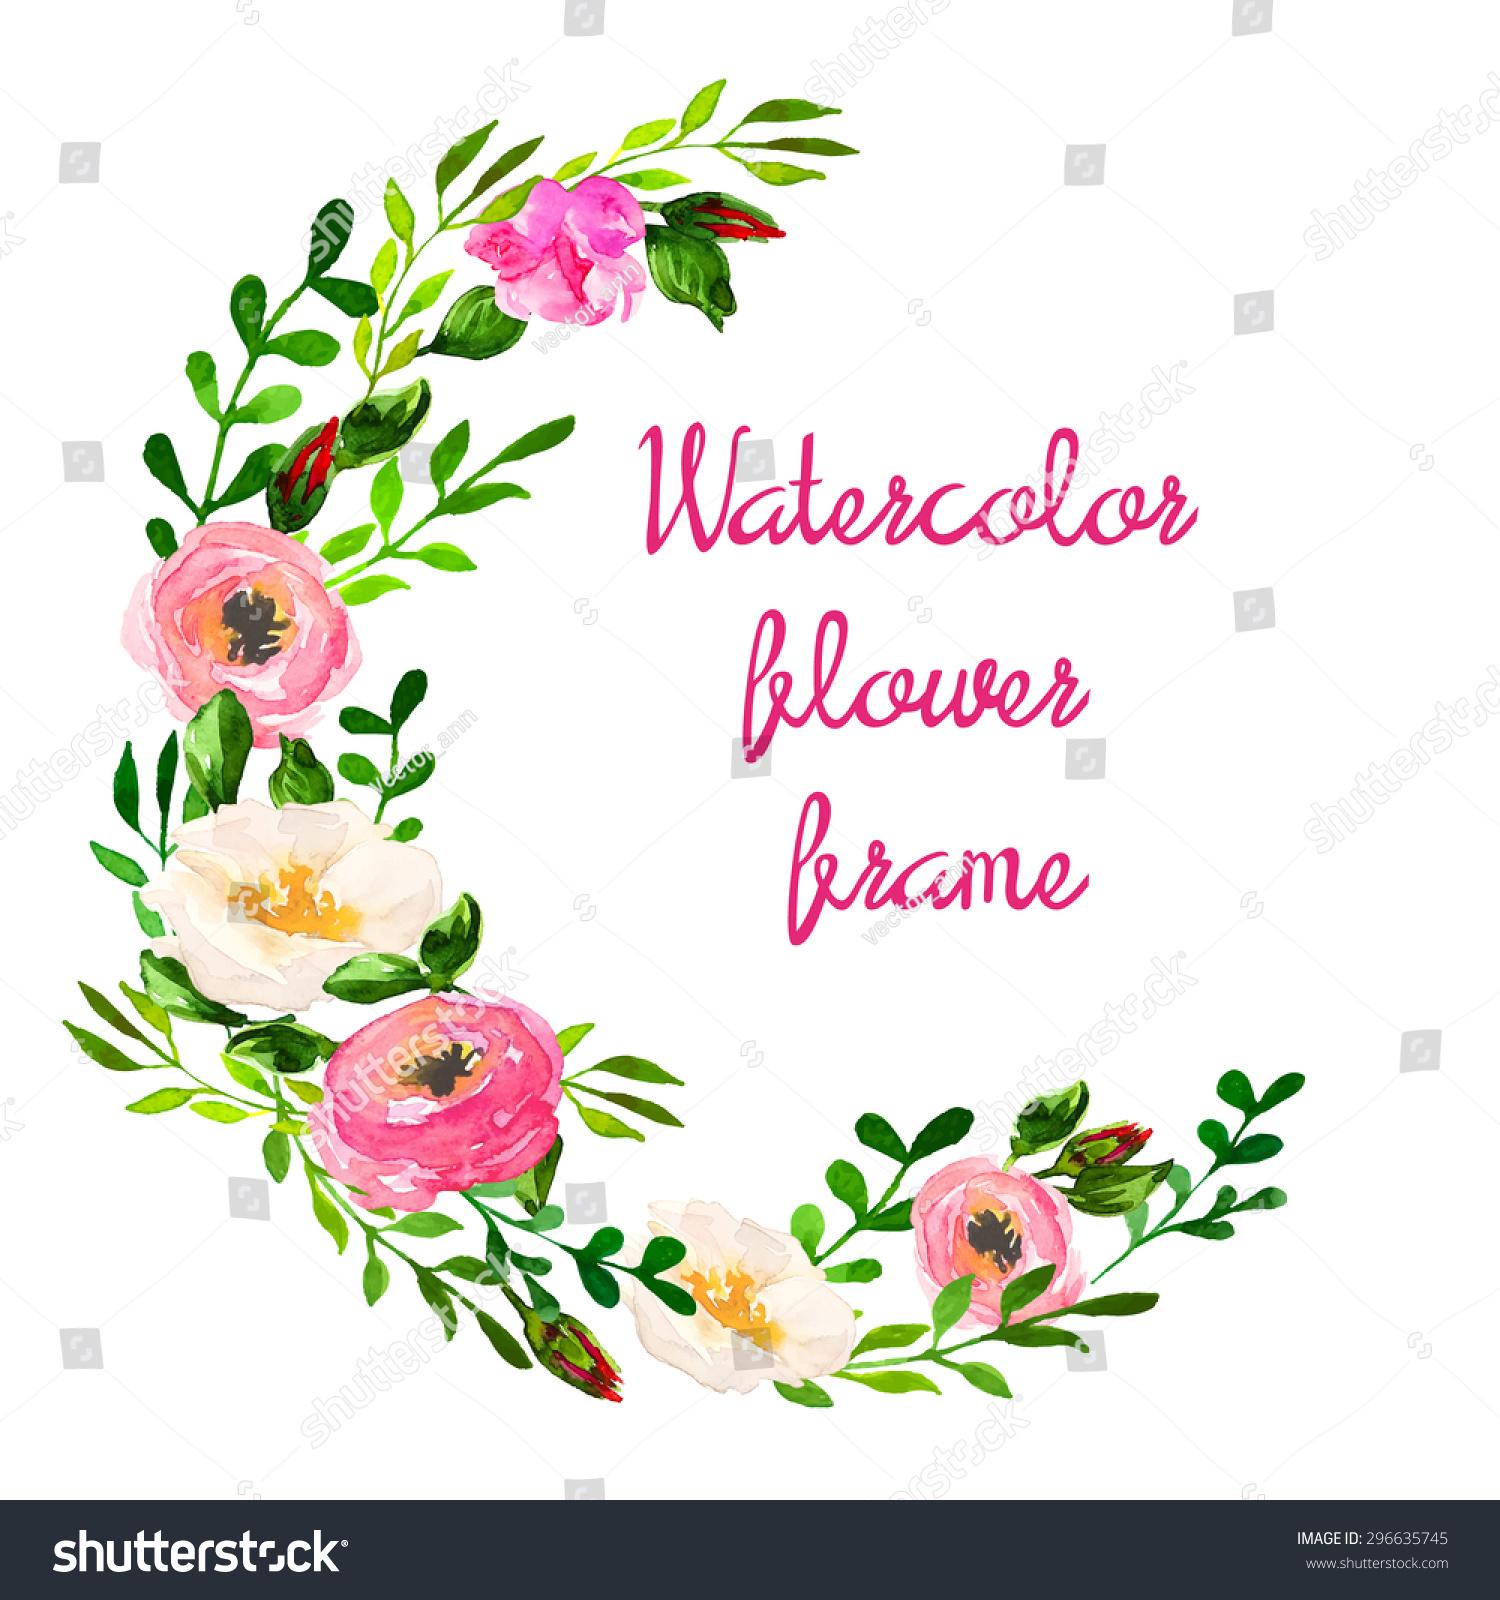 Garden Wedding Invitation Designs for great invitations template